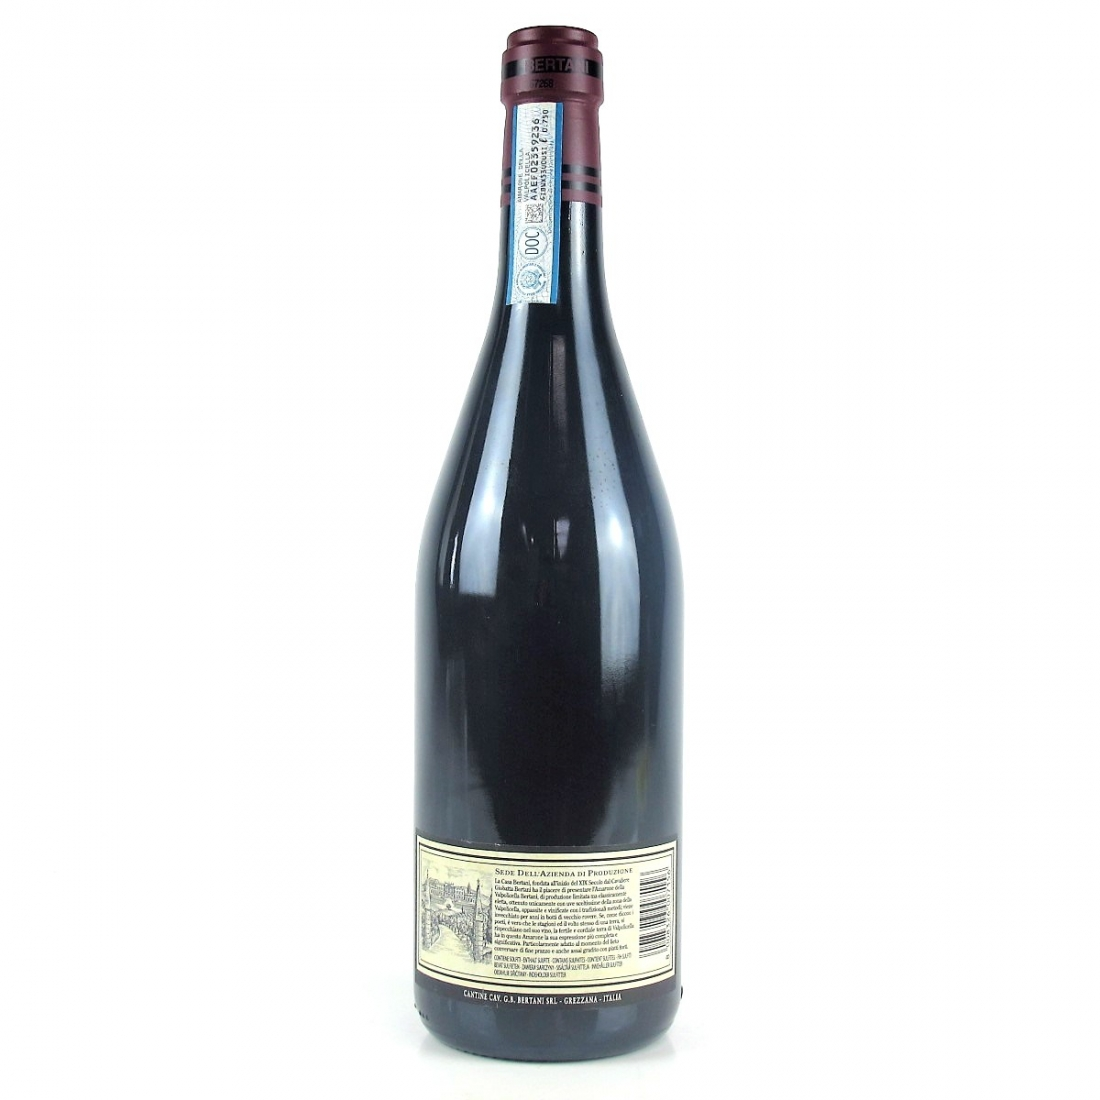 Bertani 2007 Amarone